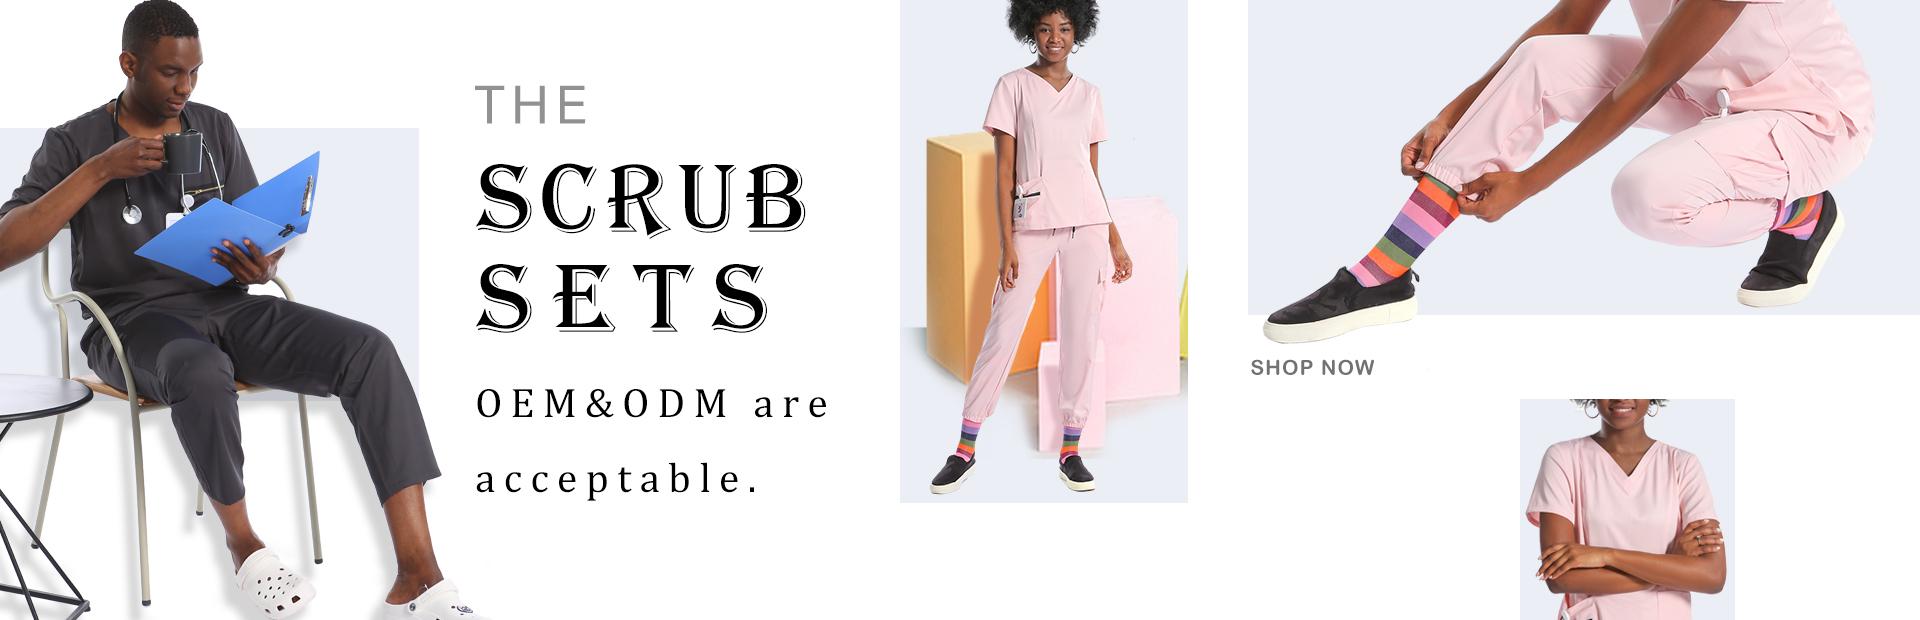 Scrub Sets OEM/ODM